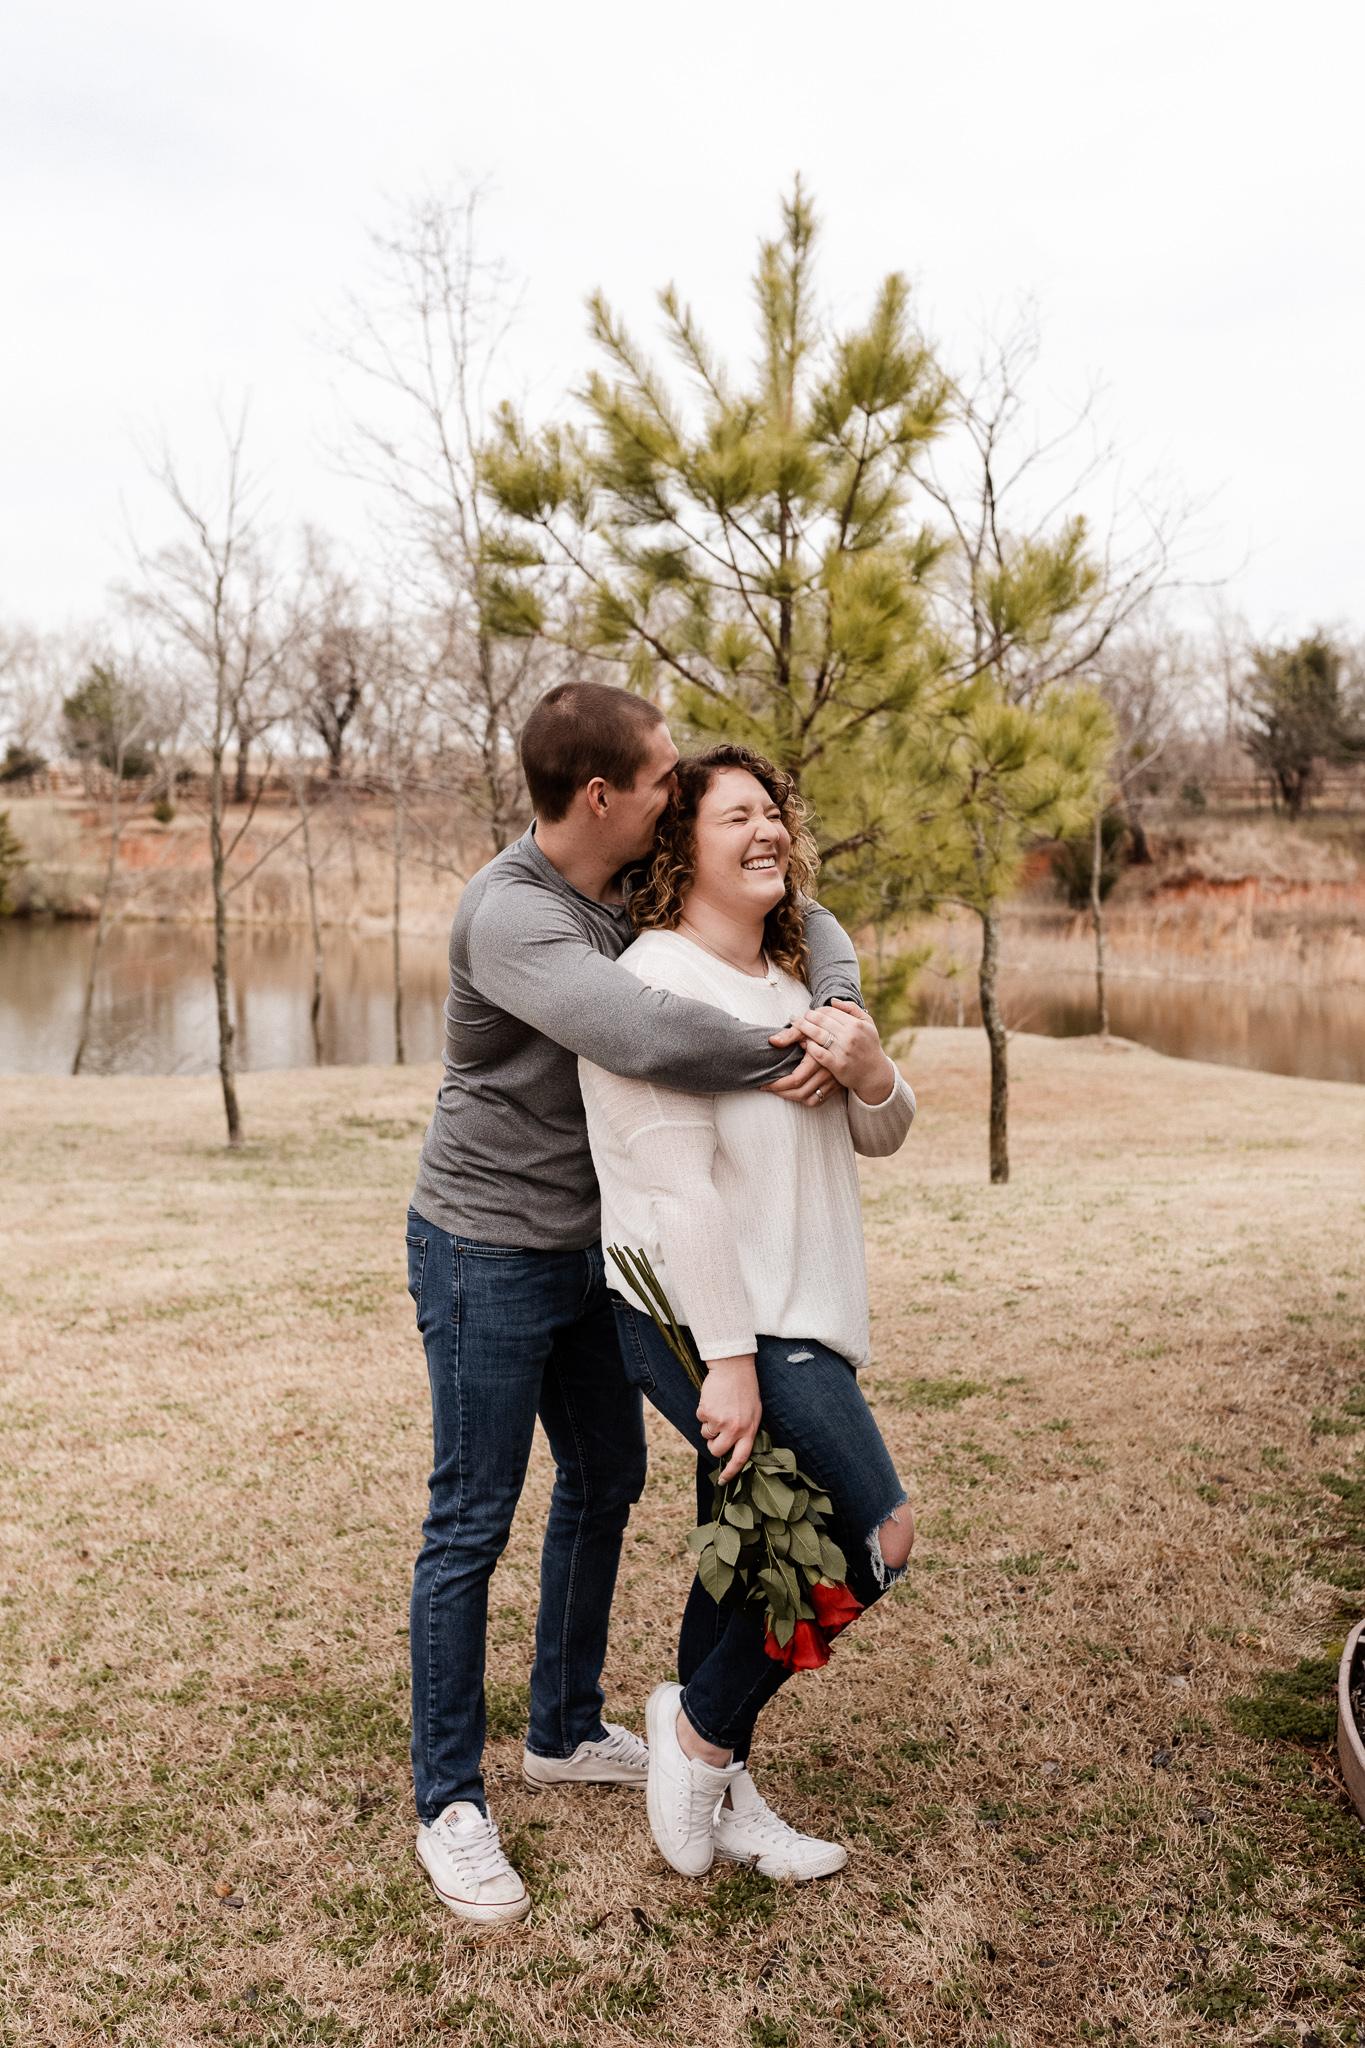 Daniel + Shelby | Rustic Southwind Hills Anniversary | Oklahoma Lifestyle Photographer-24.jpg